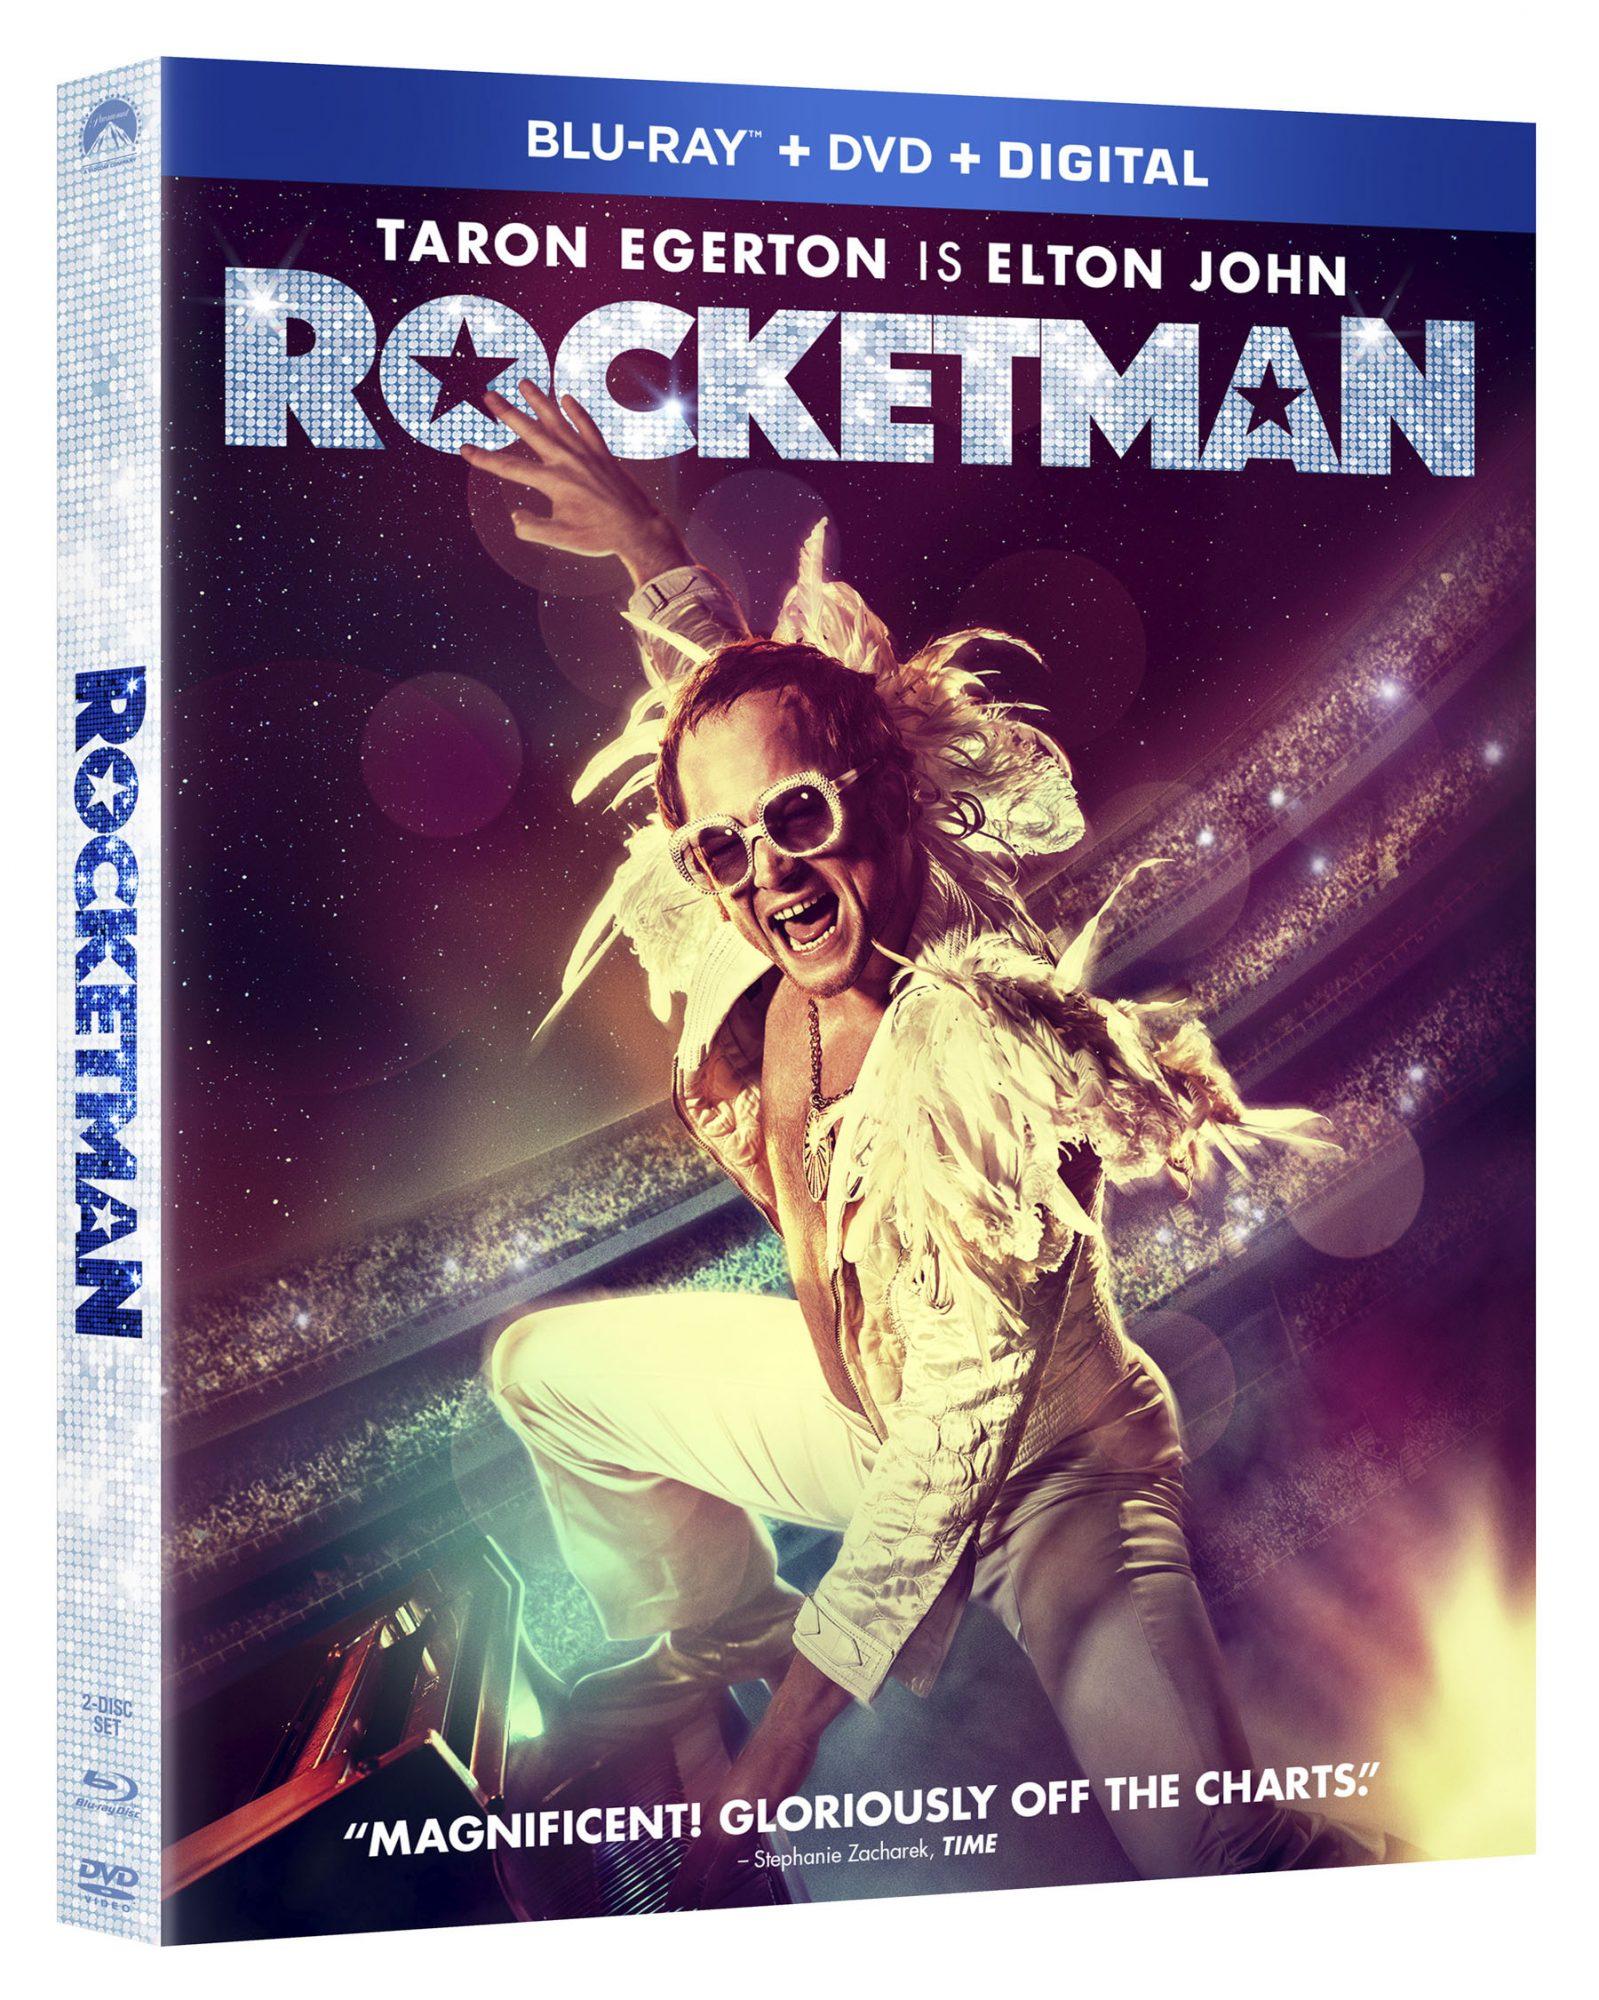 Rocketman DVD/BLU-RAY box art CR: Paramount Pictures